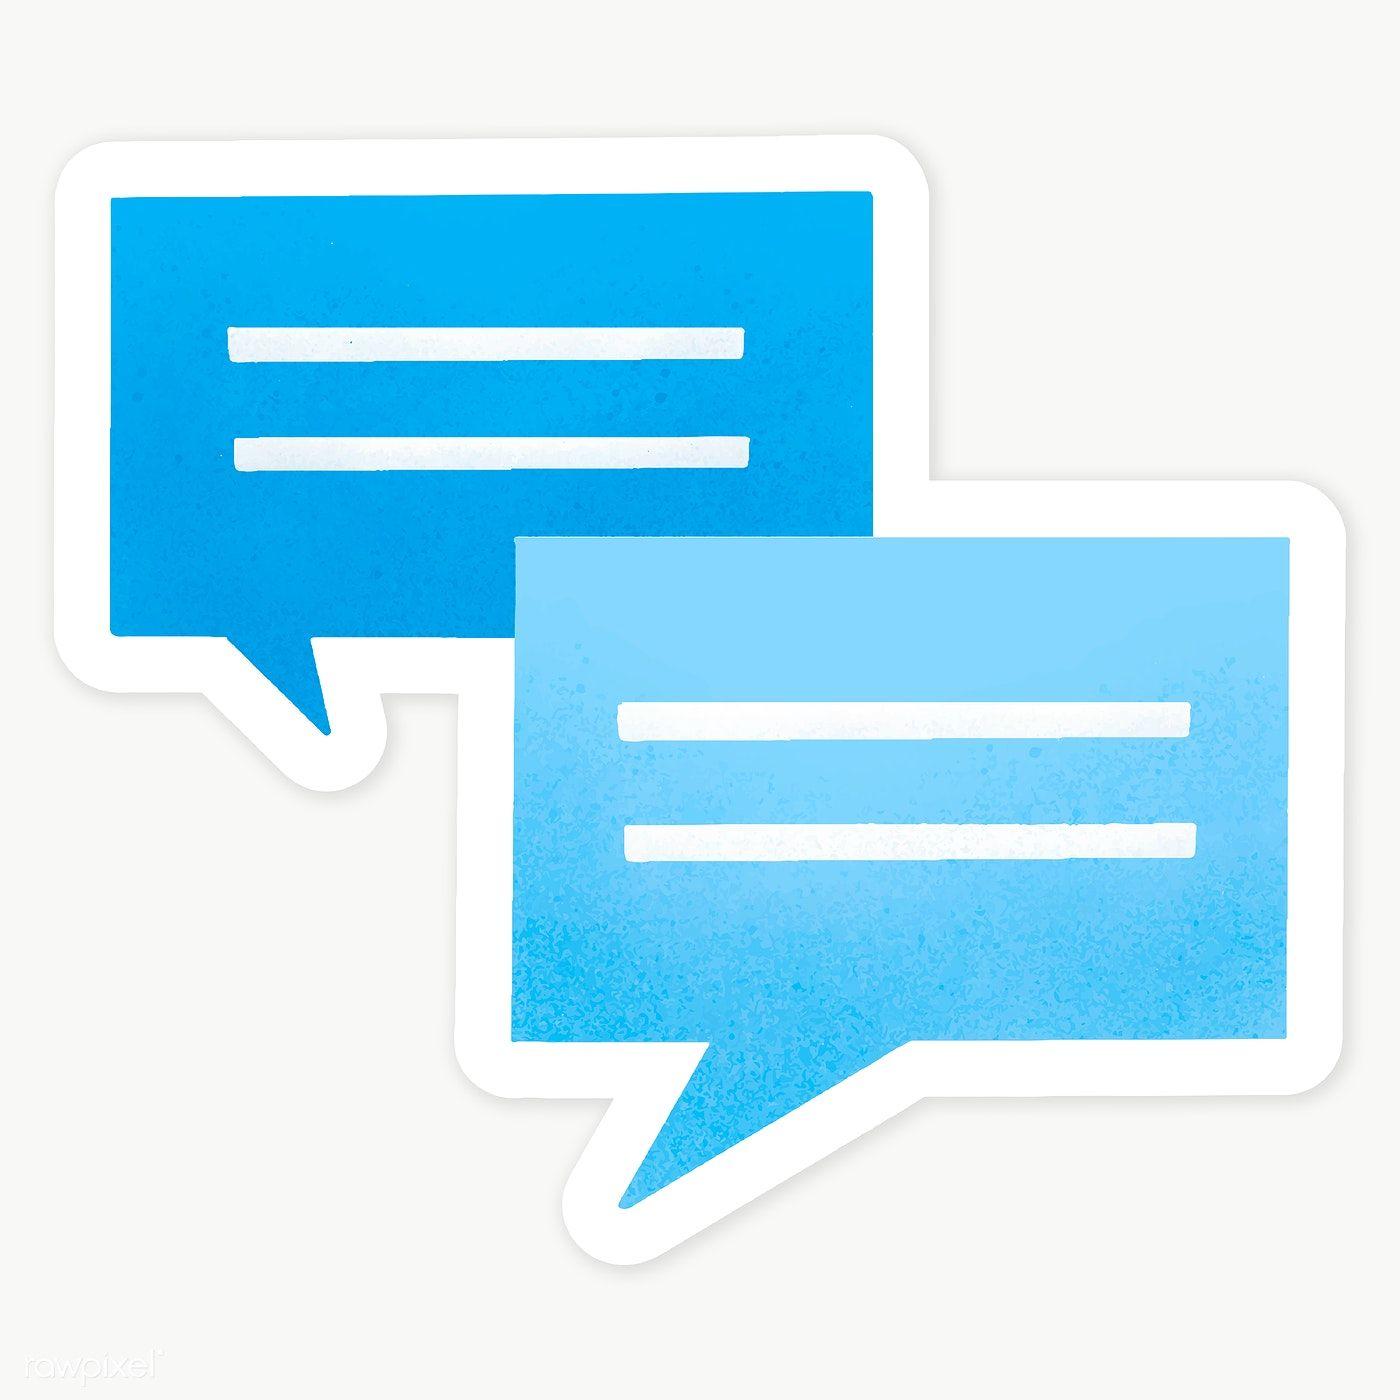 Blue Chat Box Social Media Template Transparent Png Premium Image By Rawpixel Com Aum Social Media Template Social Media Icons Vector Social Media